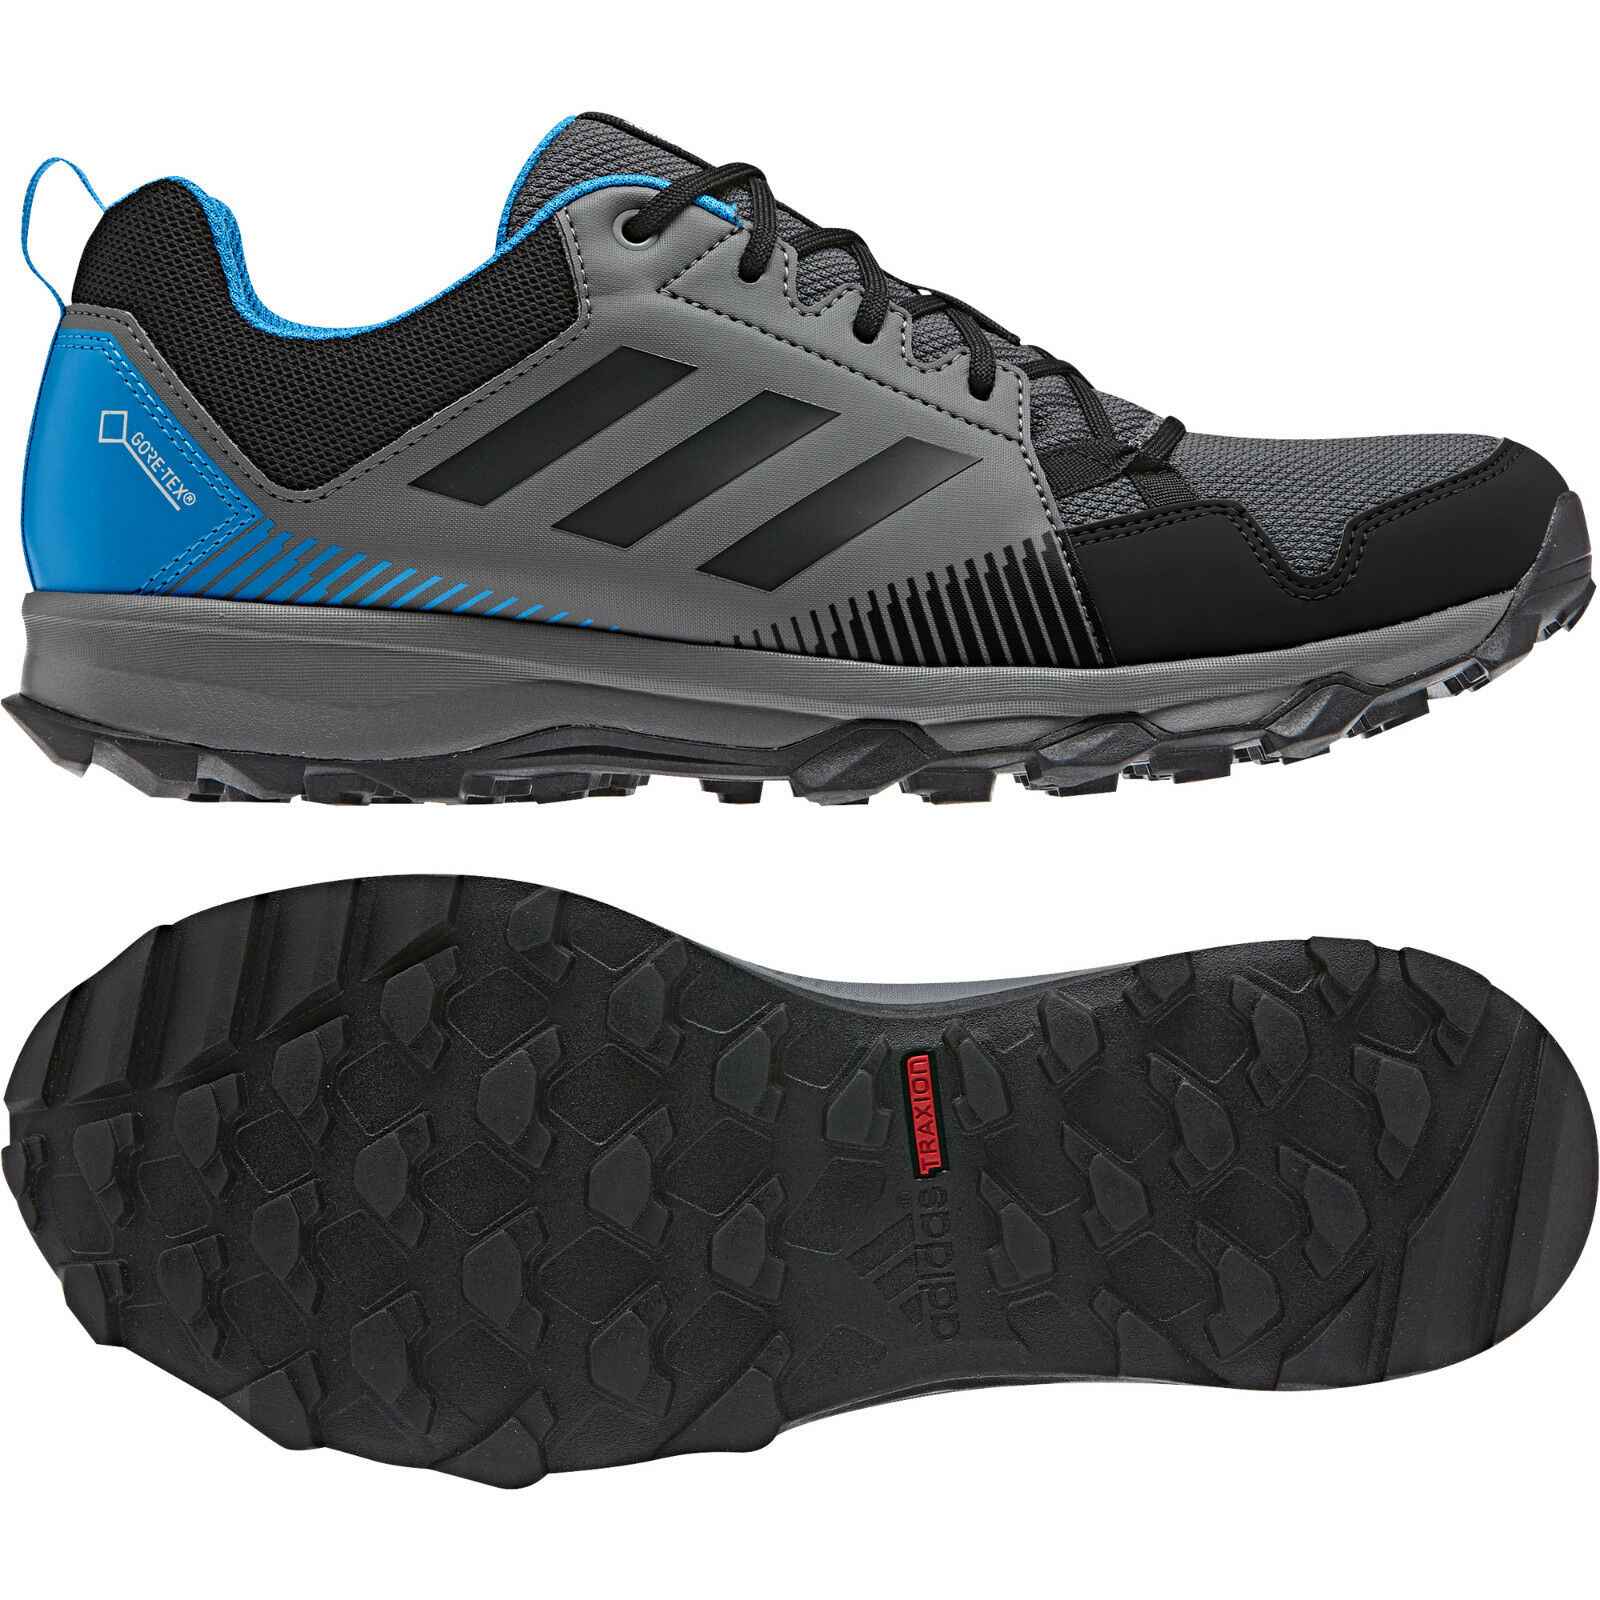 adidas Trailrunningschuhe Tracerocker Walkingschuhe Laufschuhe Gore Tex AC7938